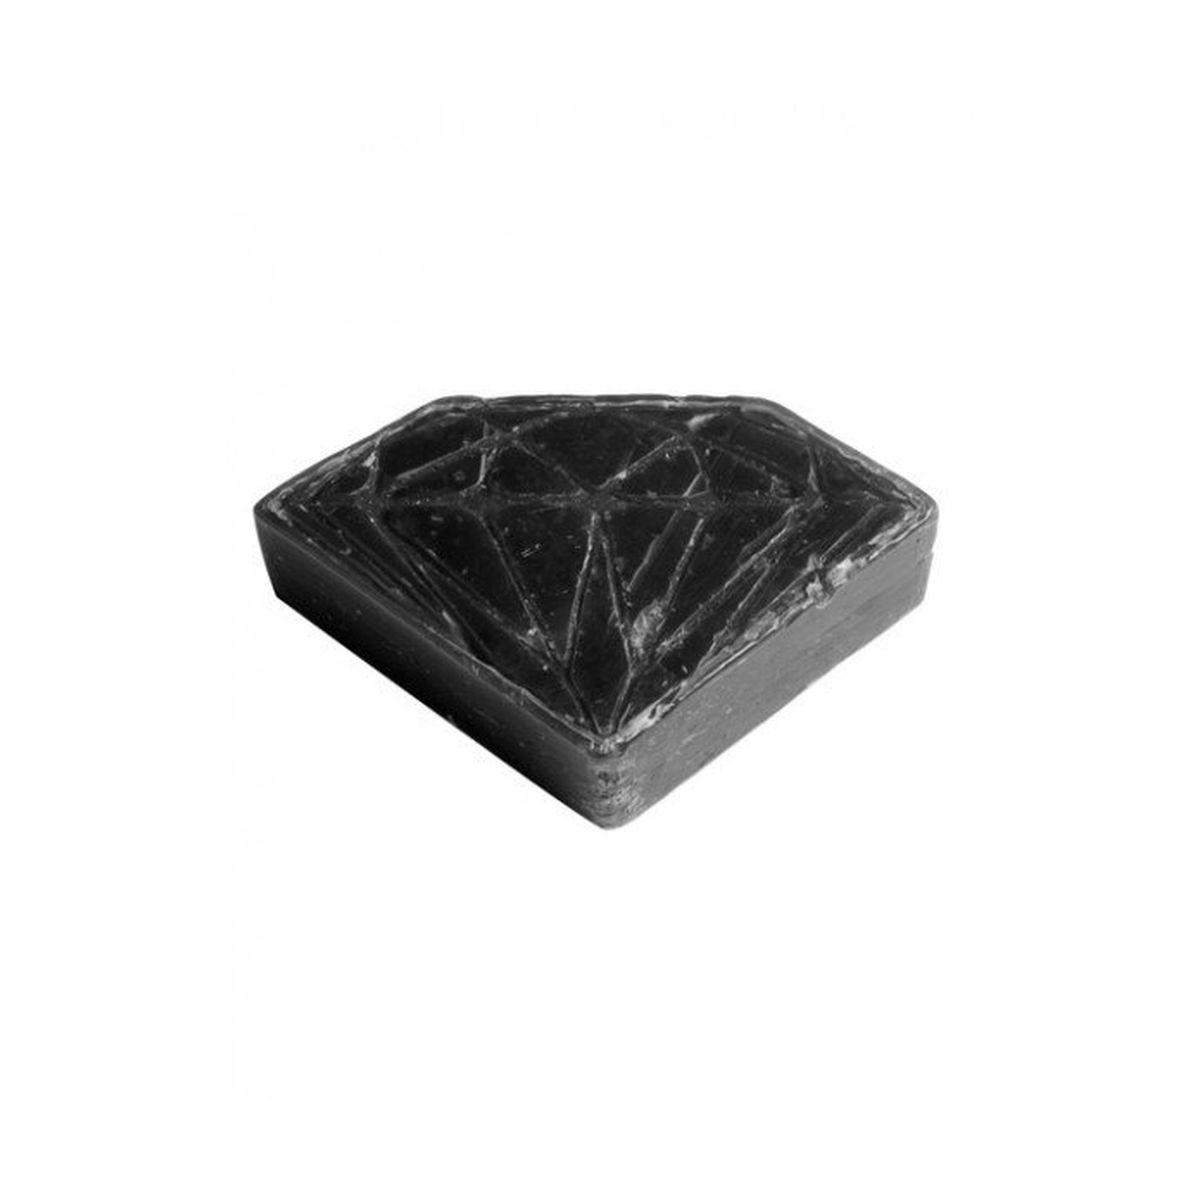 Wosk Diamond Supply Co.Hella Slick Wax Black Mini